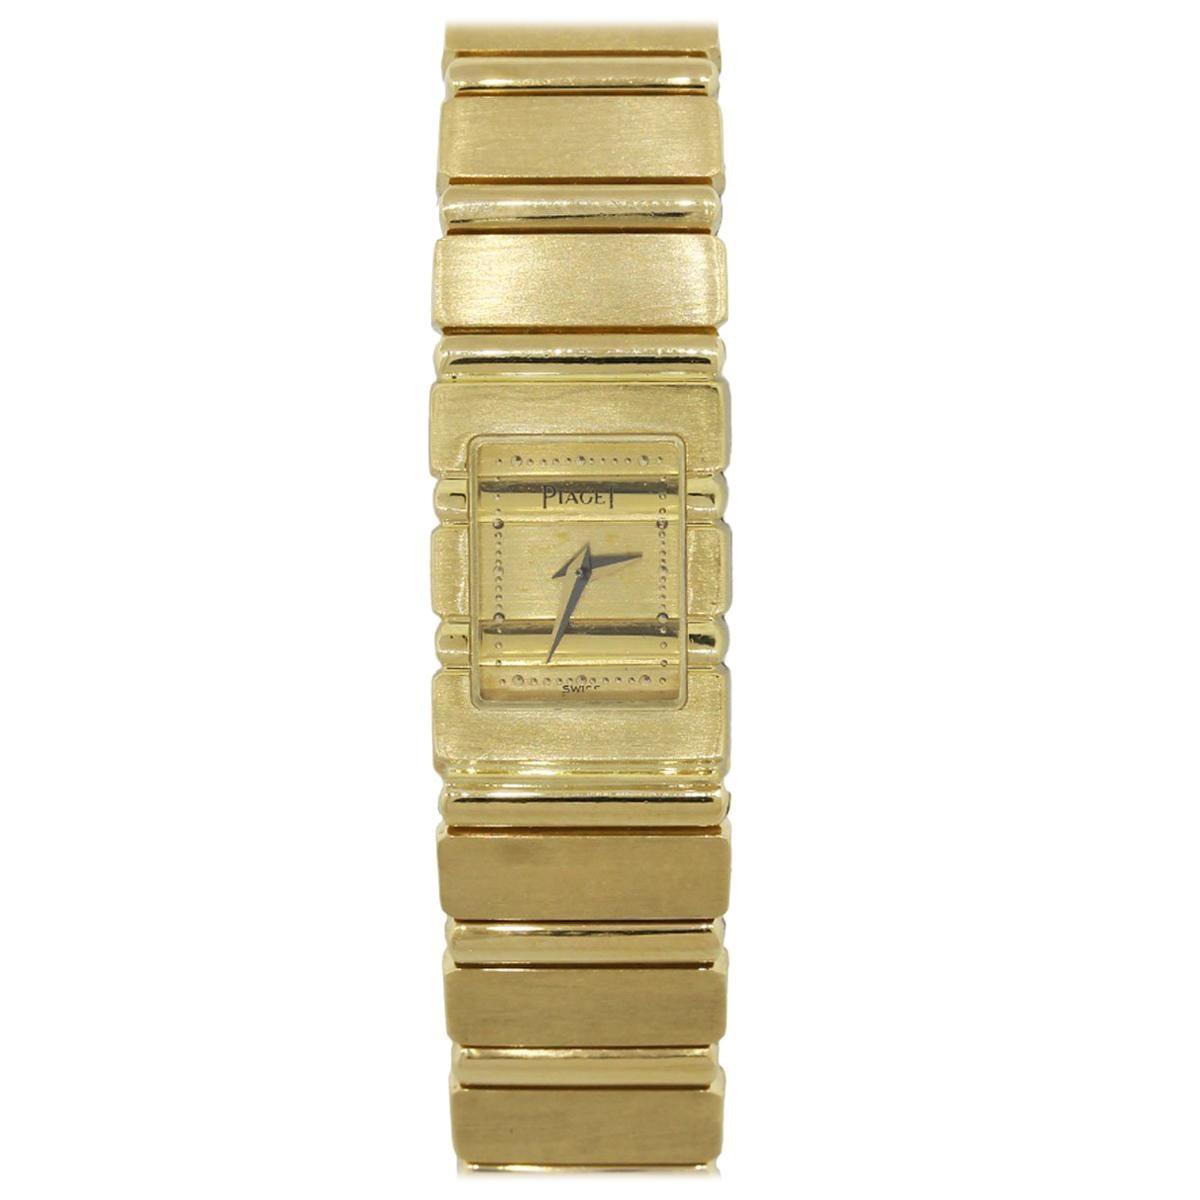 Piaget 15201 Polo Wristwatch